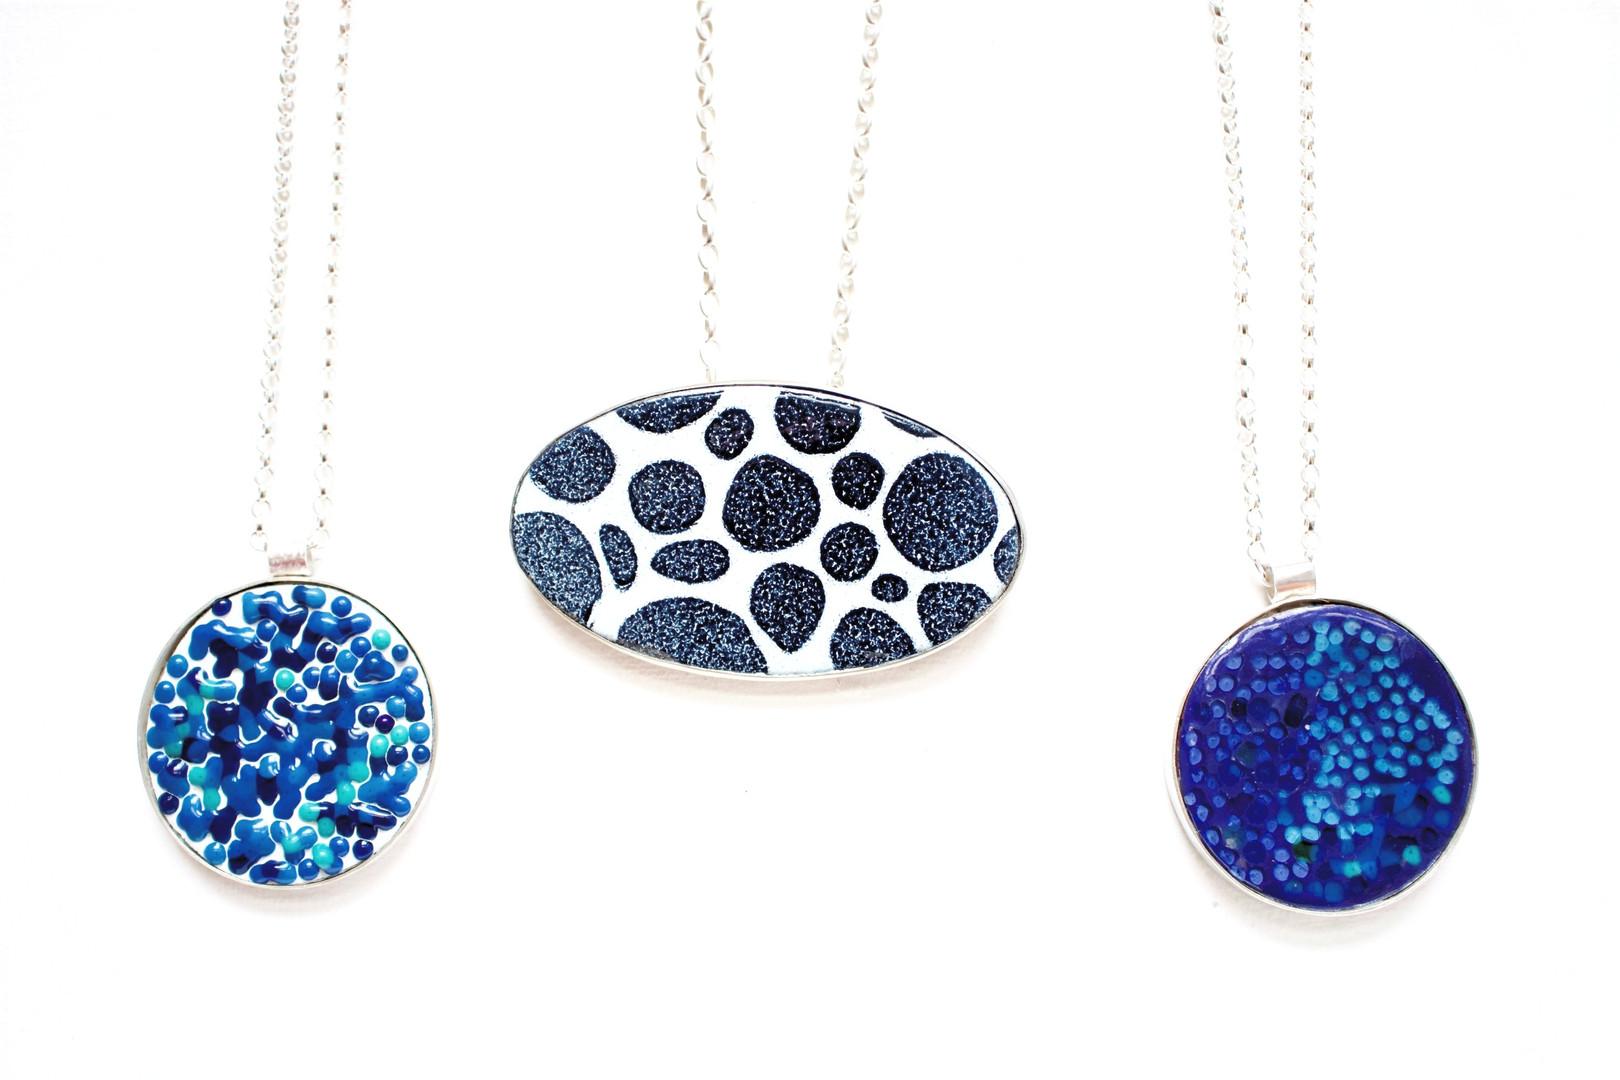 Enamelled Necklaces